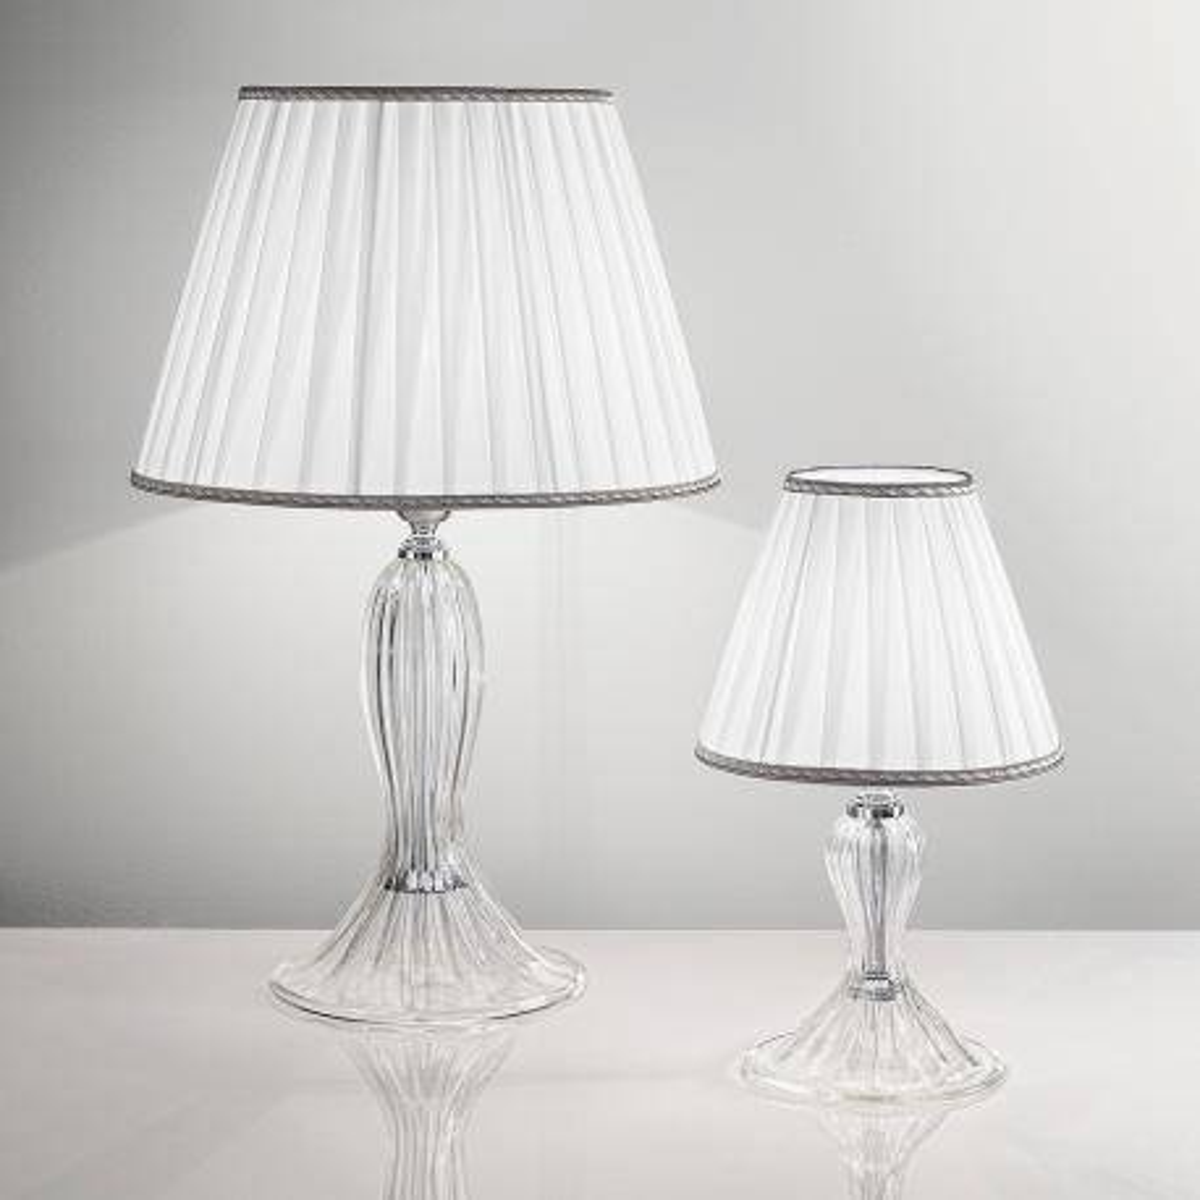 """Cloe"" lampe de table en verre de Murano - 1 lumière - transparent"